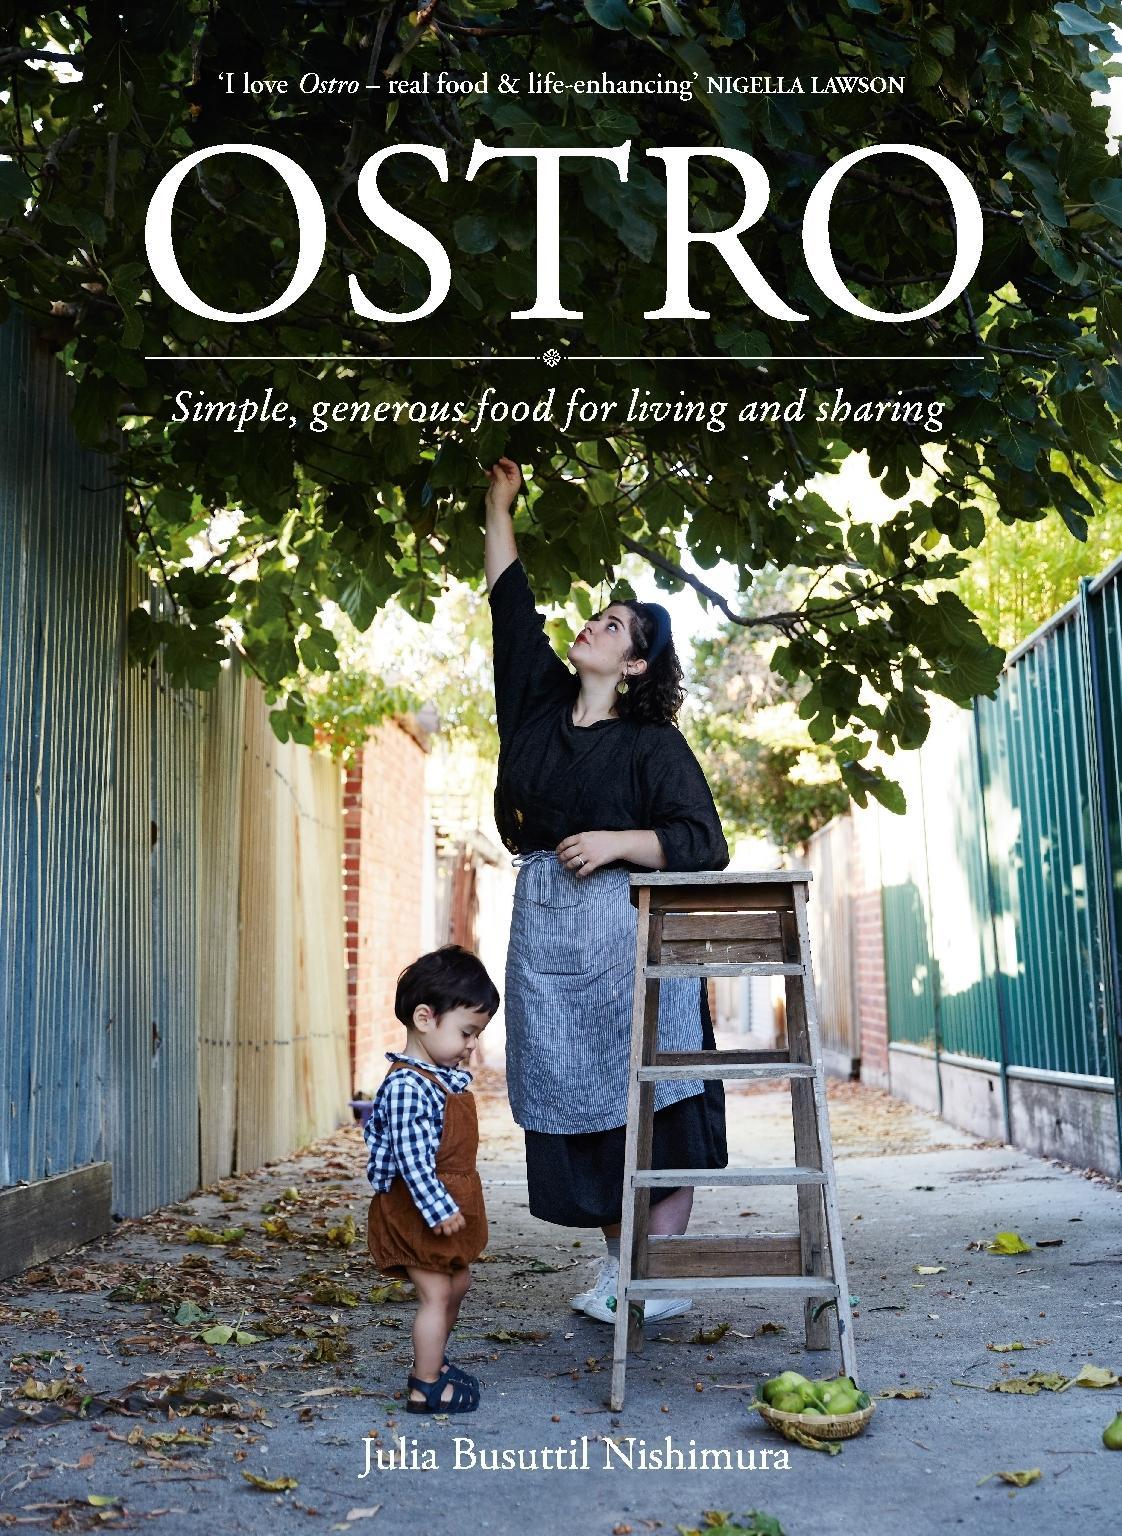 Ostro: Simple, Generous Food for LivingandSharing